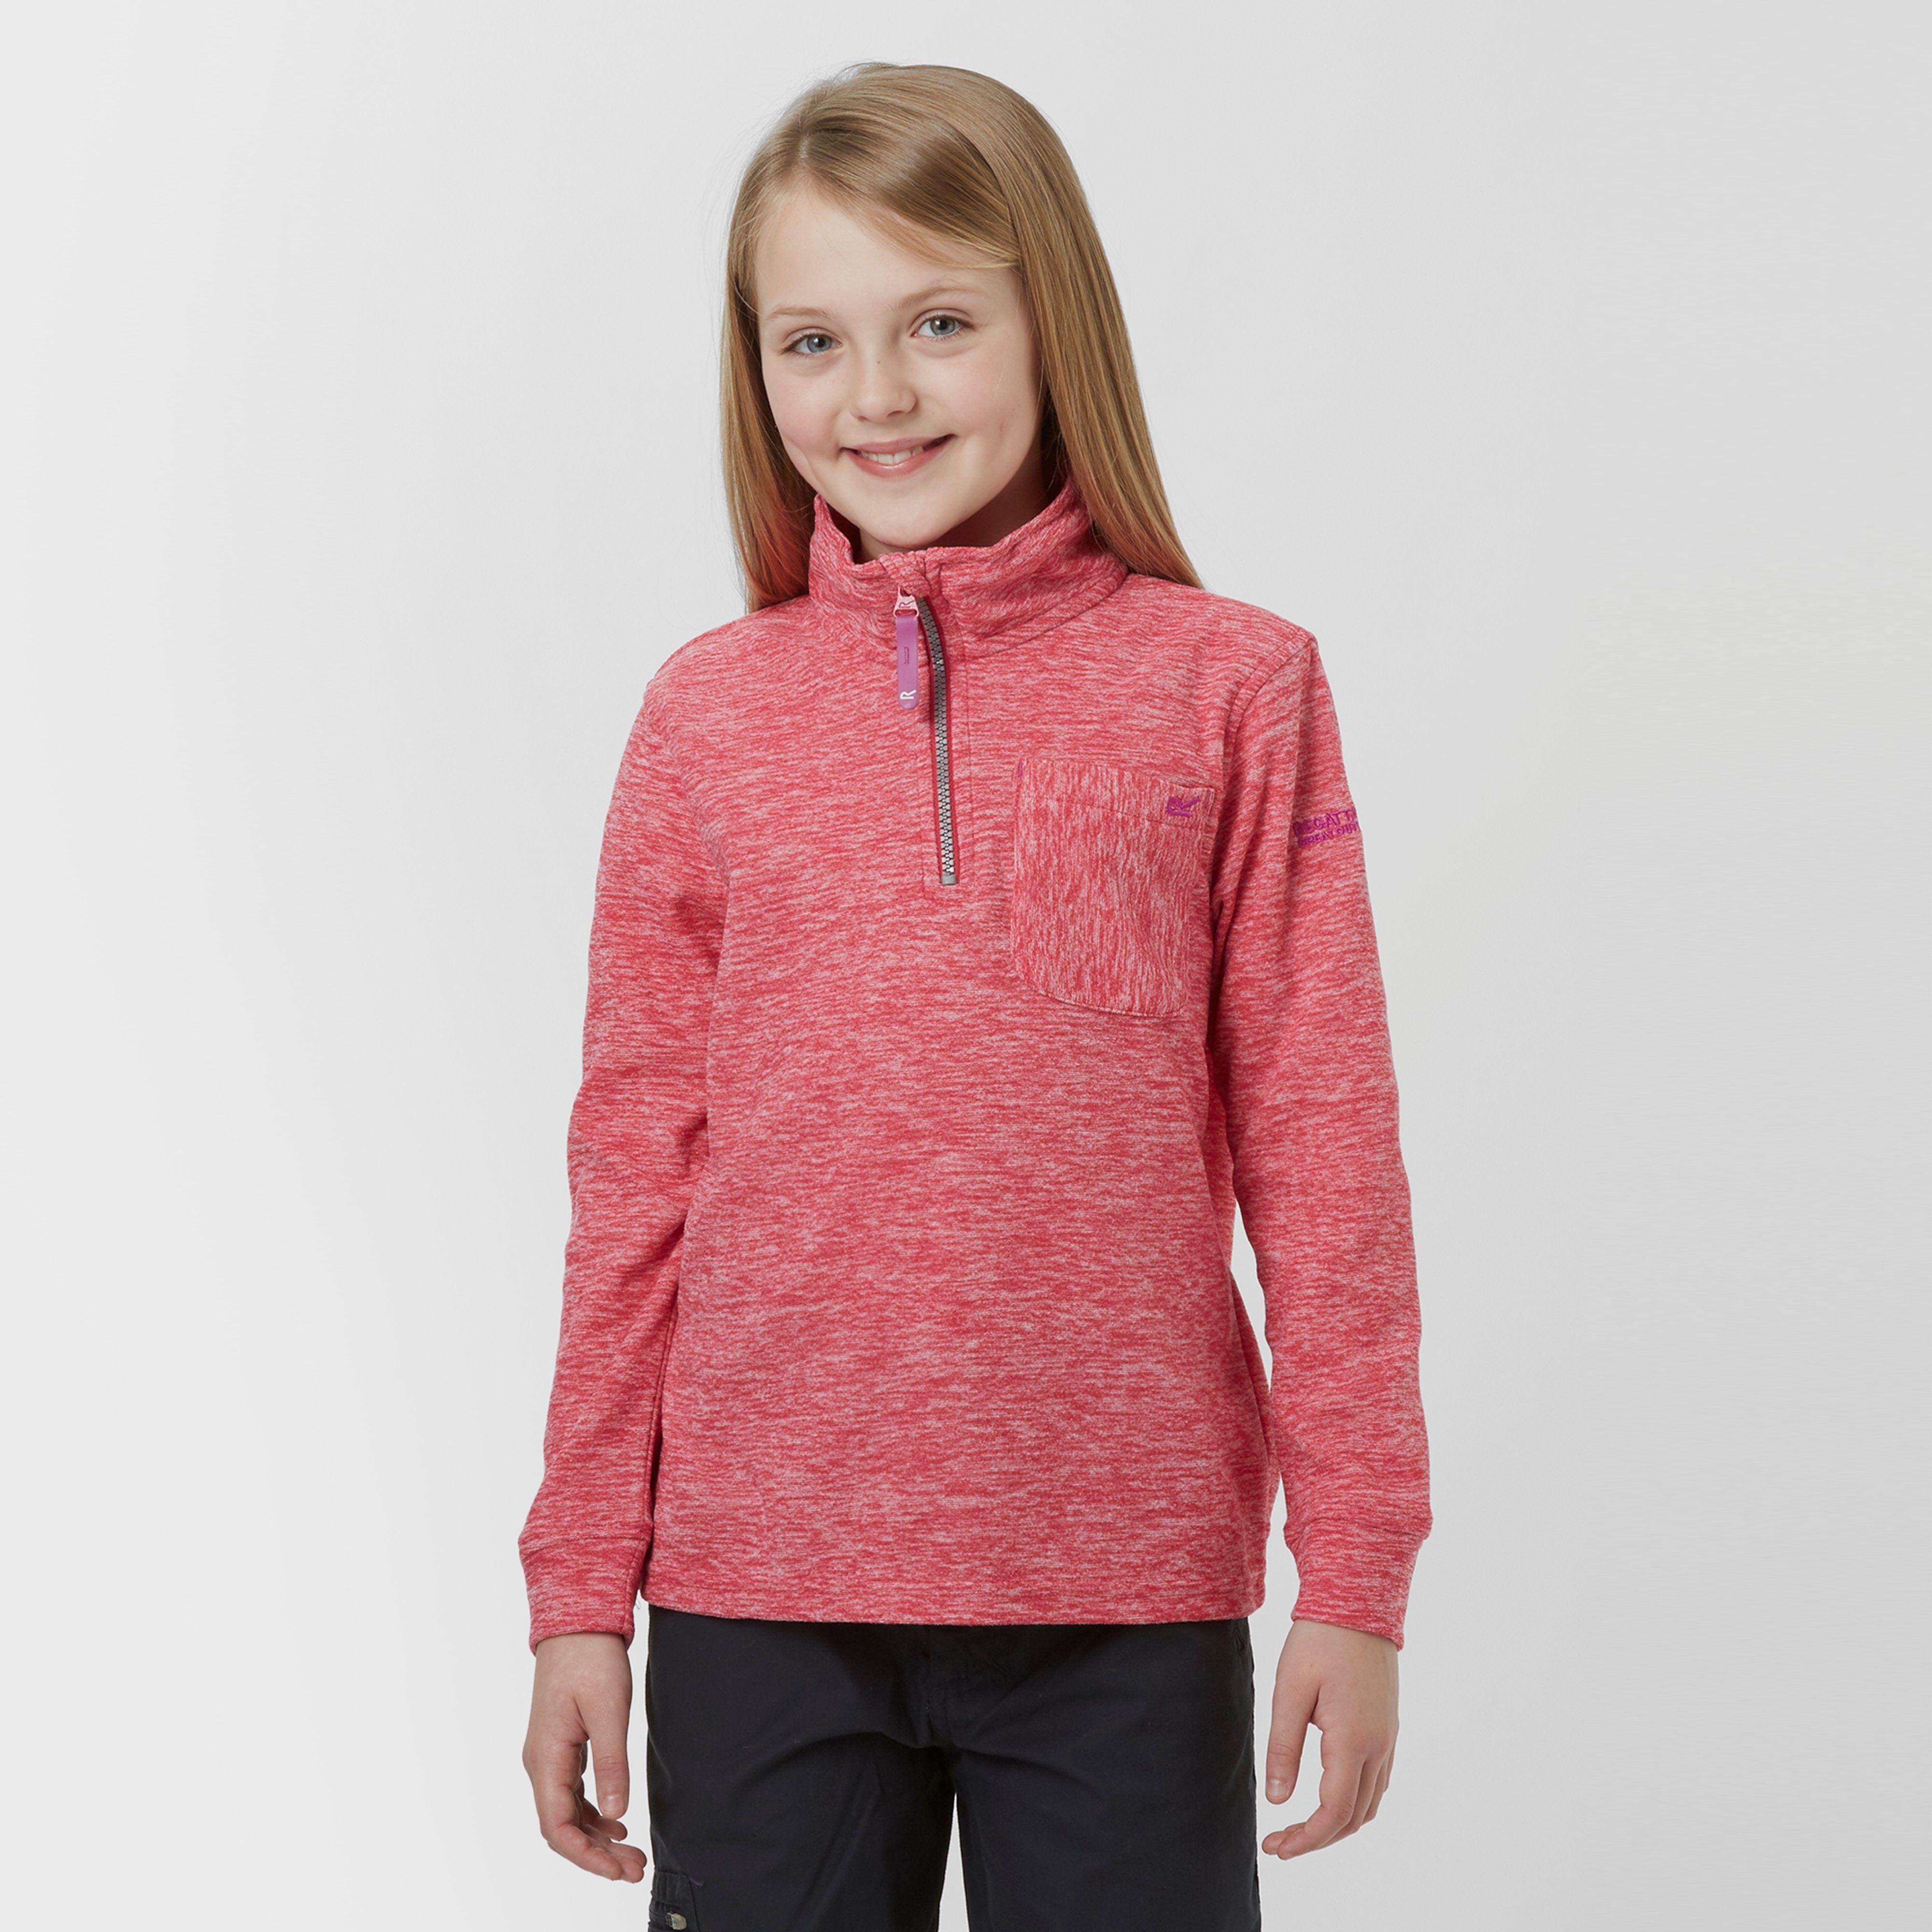 REGATTA Girl's Chopwell Fleece